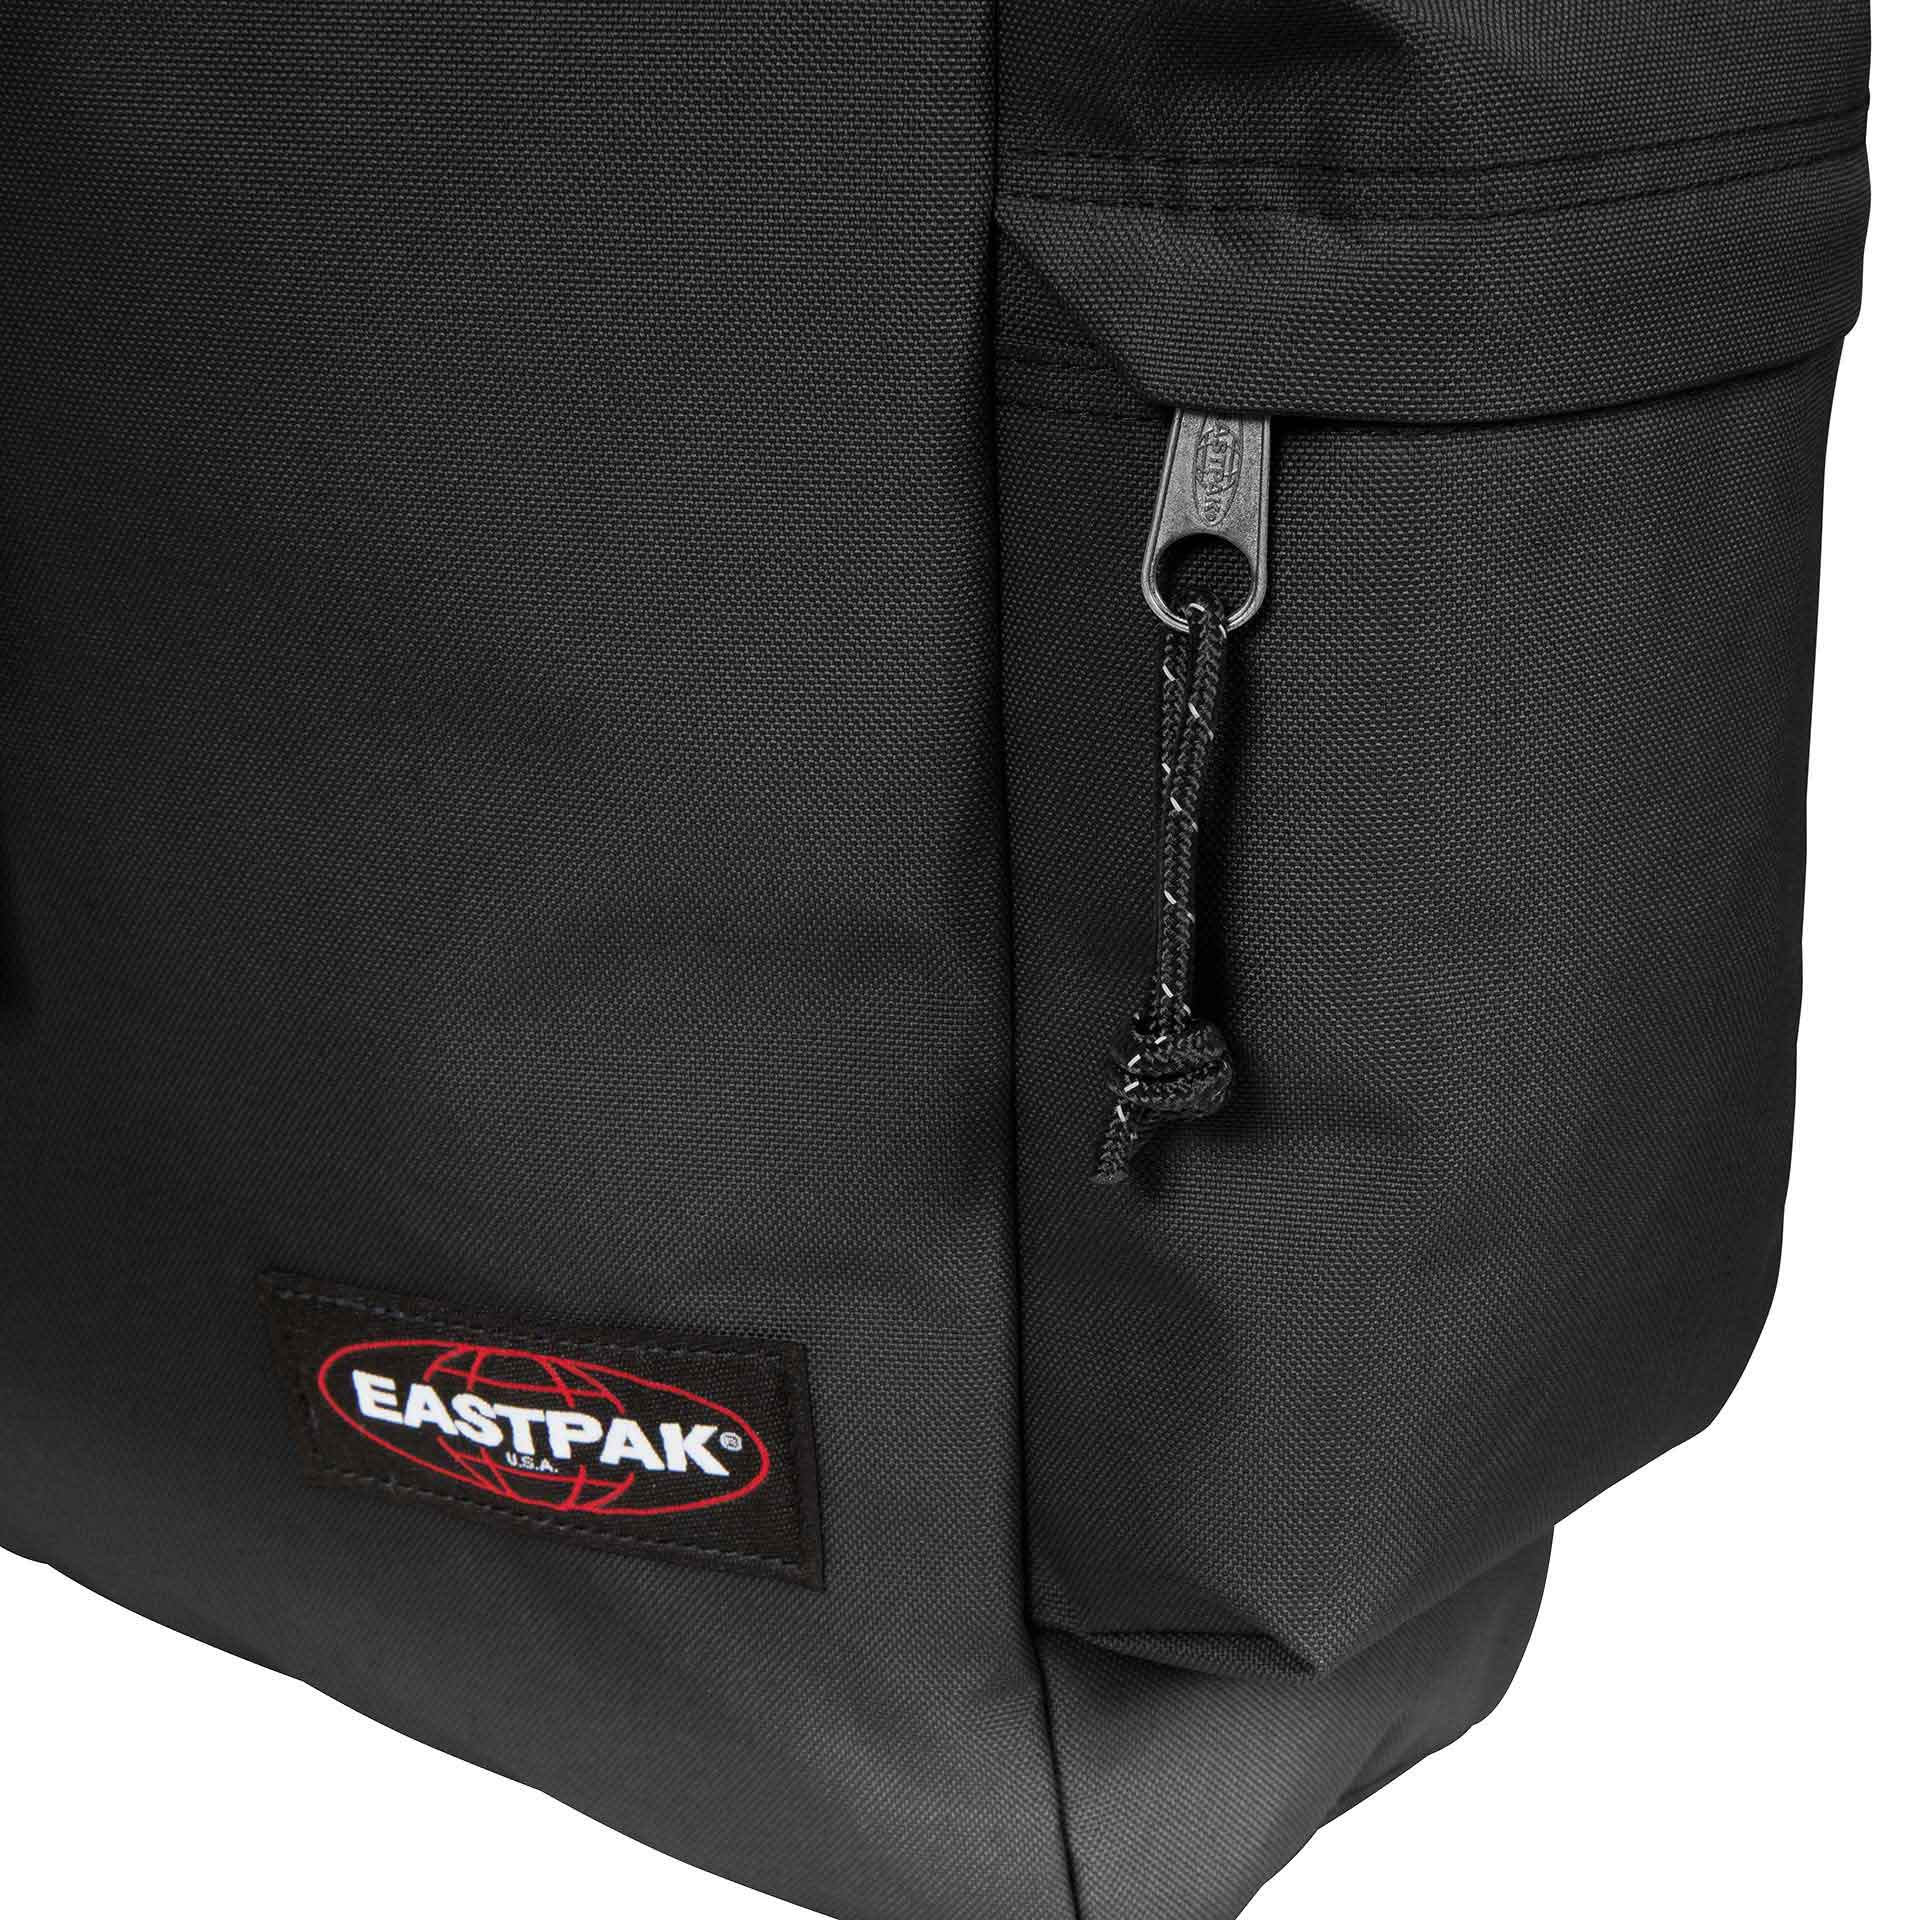 Eastpak Austin Rucksack black